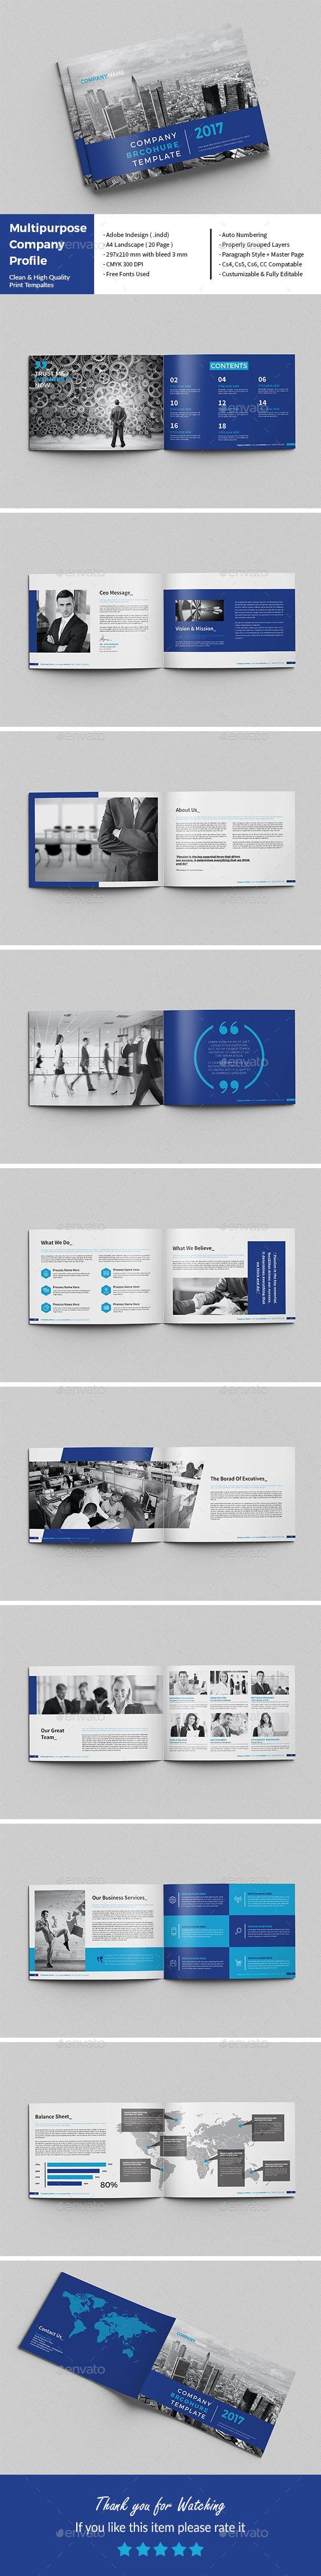 Multipurpose Company Profile | Indesign templates, Company profile ...